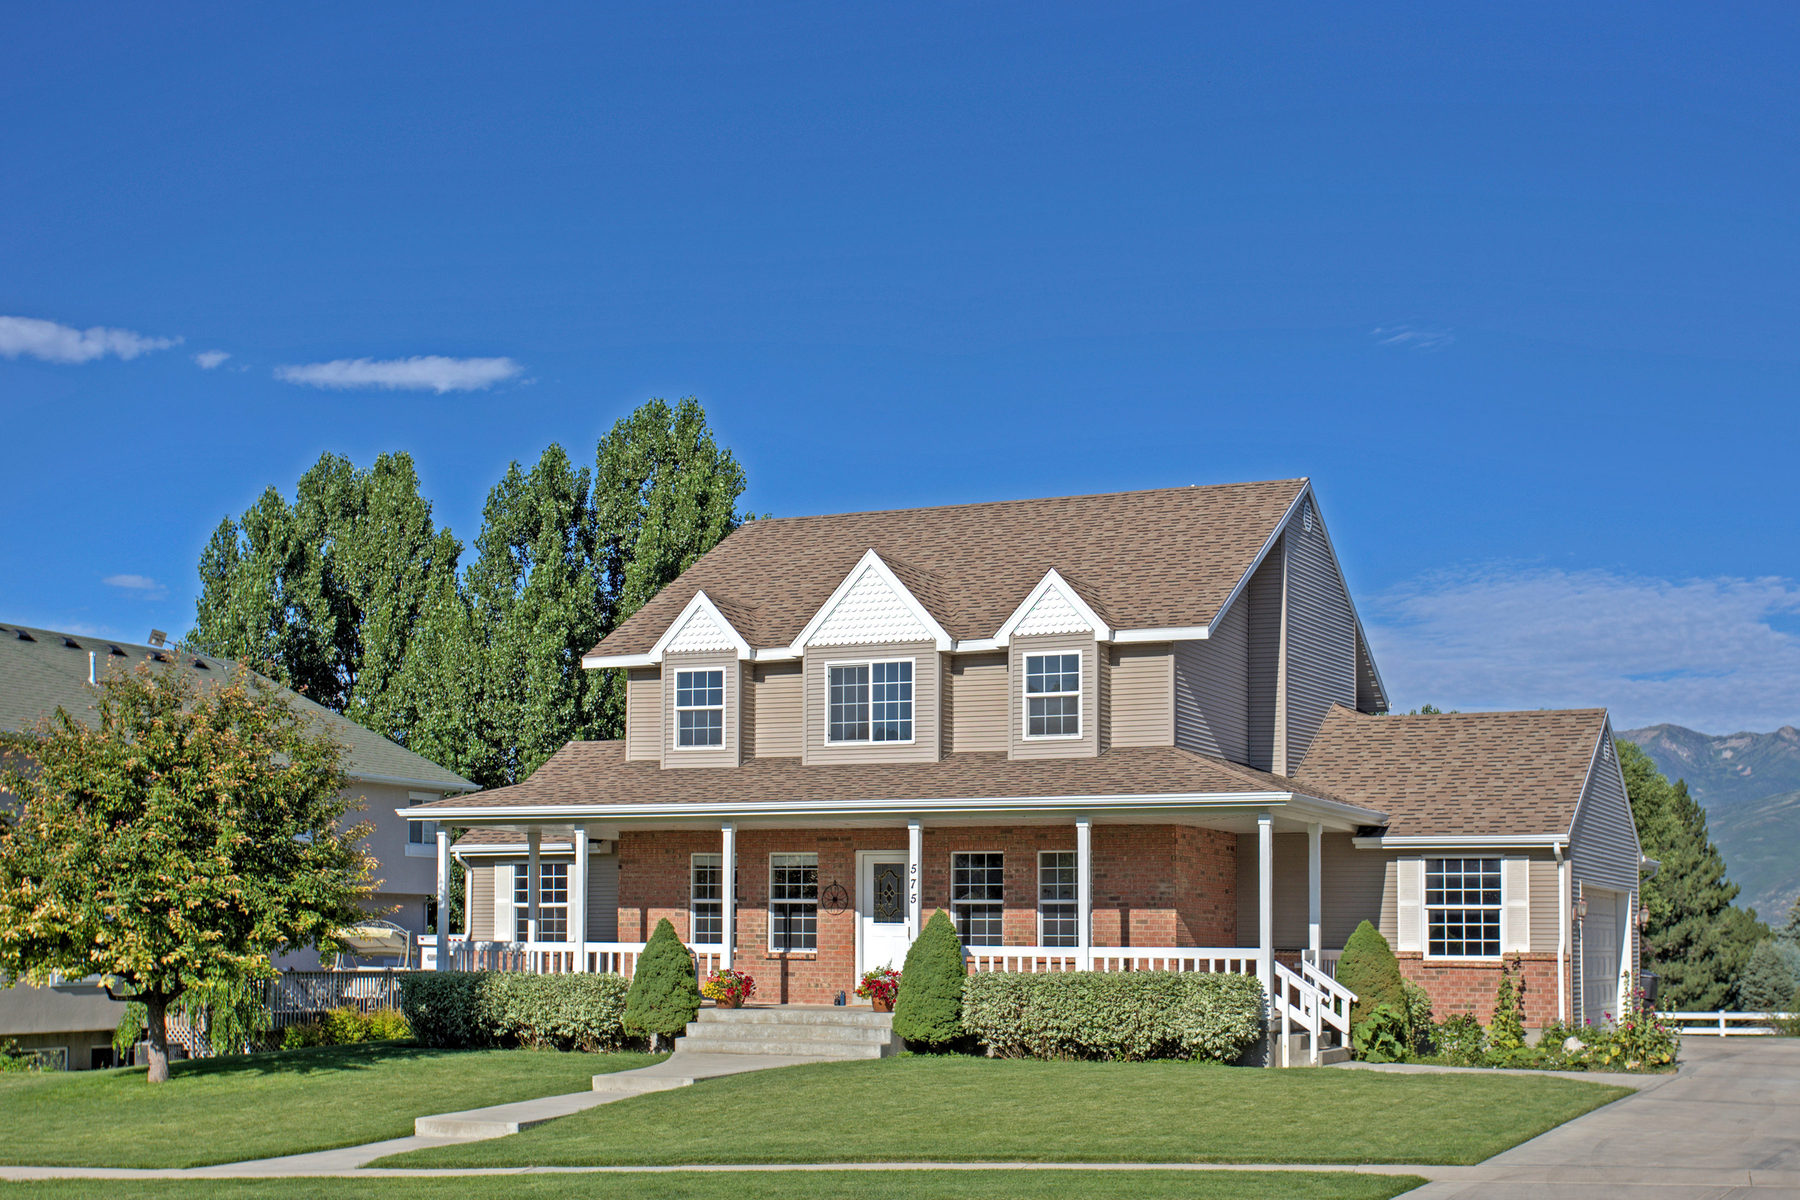 Villa per Vendita alle ore Views-Land-Wonderful Custom Home 575 North 750 East Heber City, Utah 84032 Stati Uniti